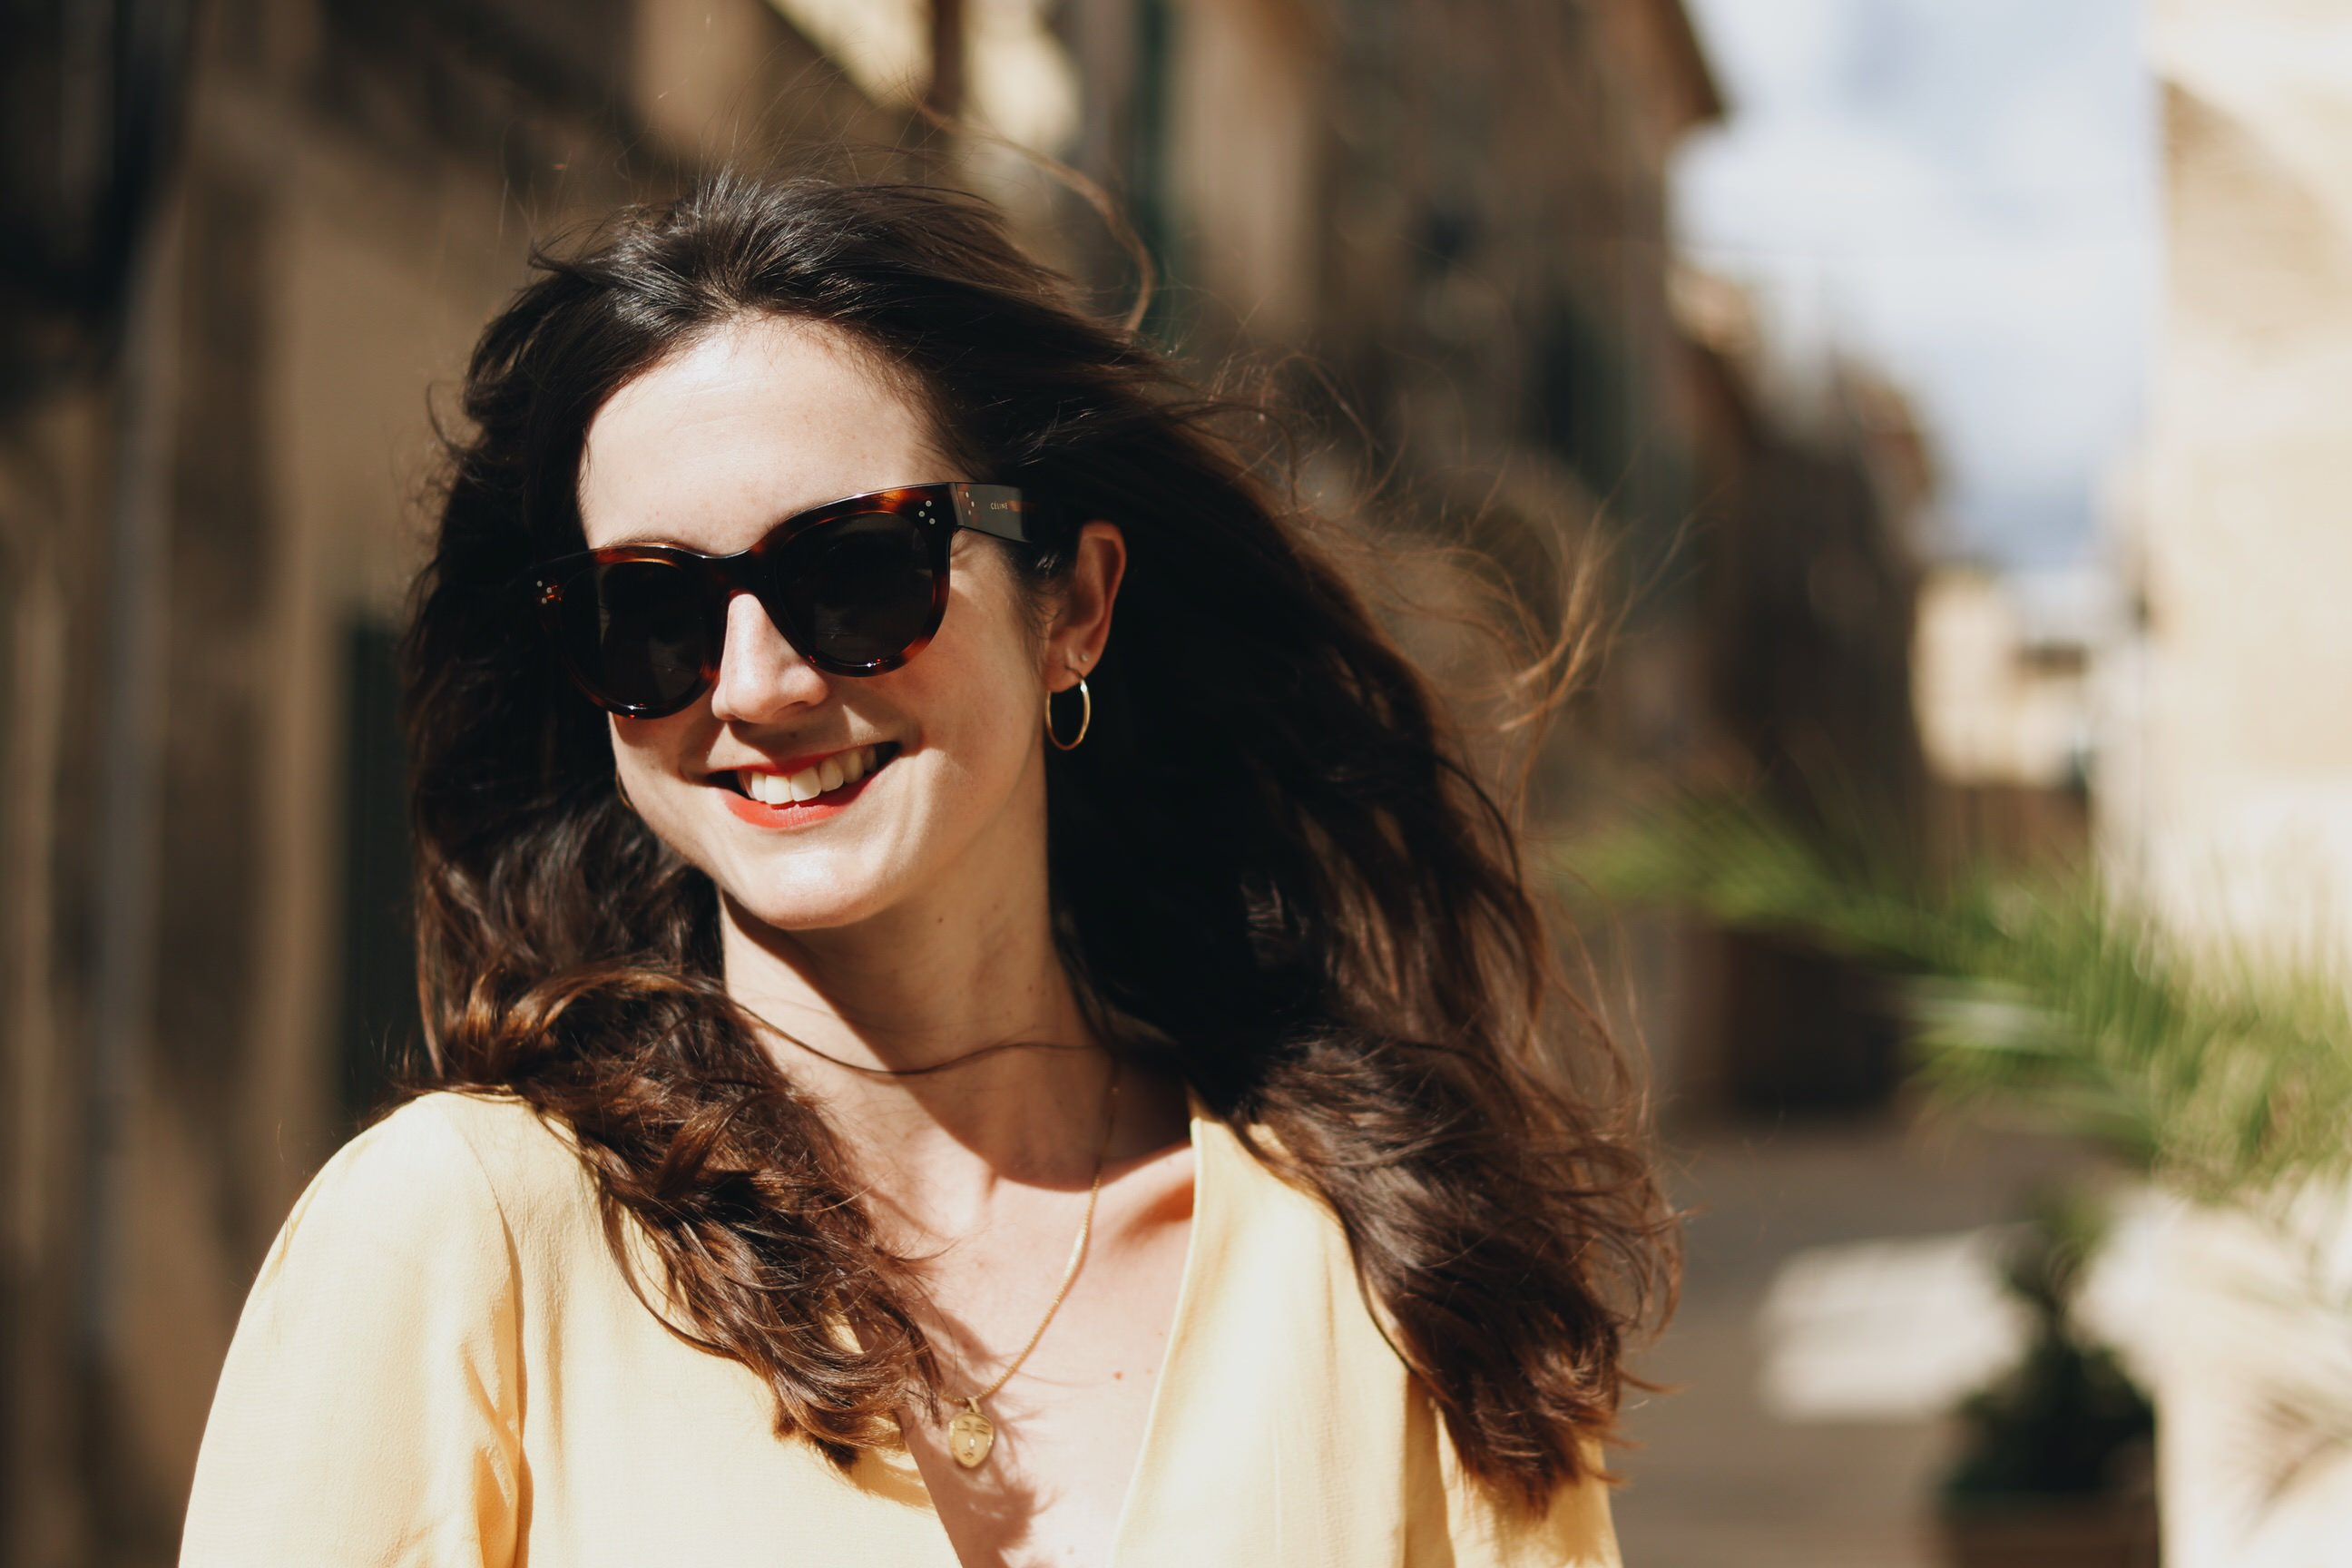 Trends Sommer Sonnenbrillen Celine Modebloggerin Neele deutsch top 10 Modeblog